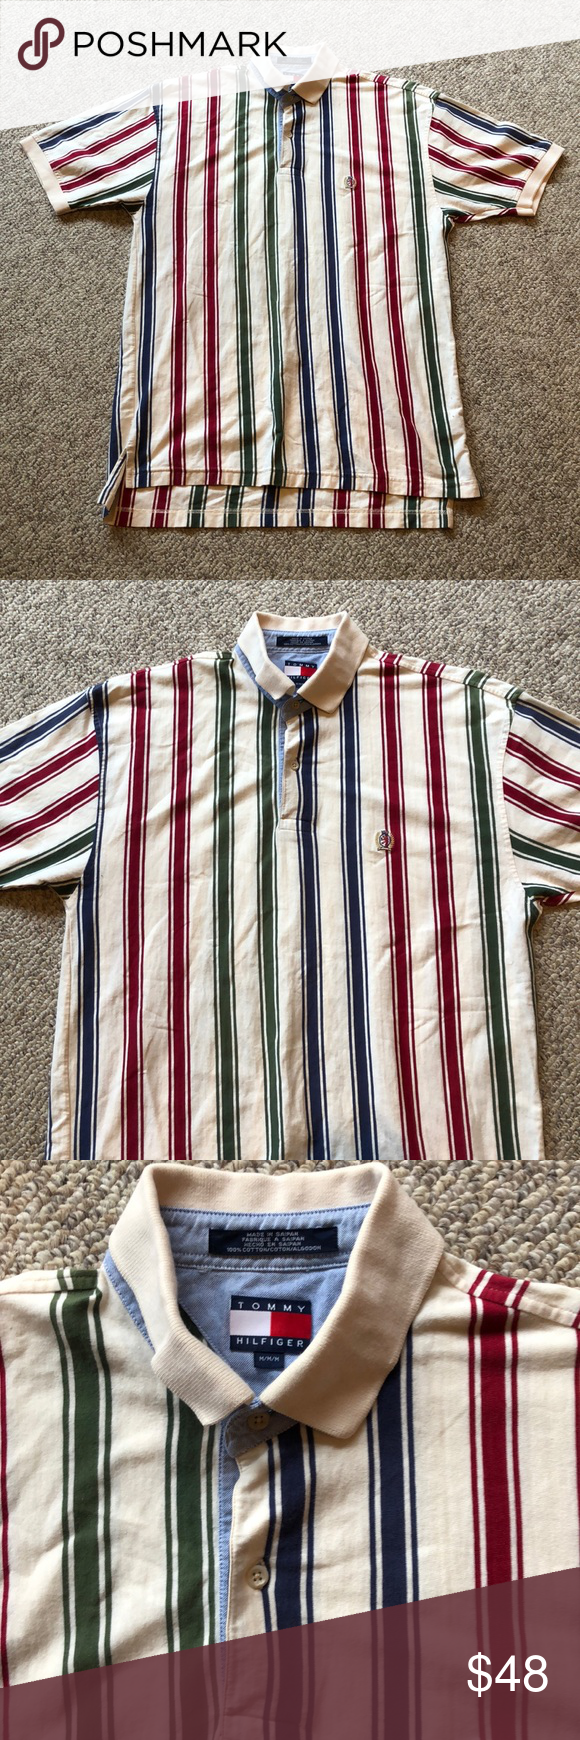 86a5ac730 Vintage Tommy Hilfiger stripped logo Polo shirt L This nice Vintage Tommy  Hilfiger striped logo polo